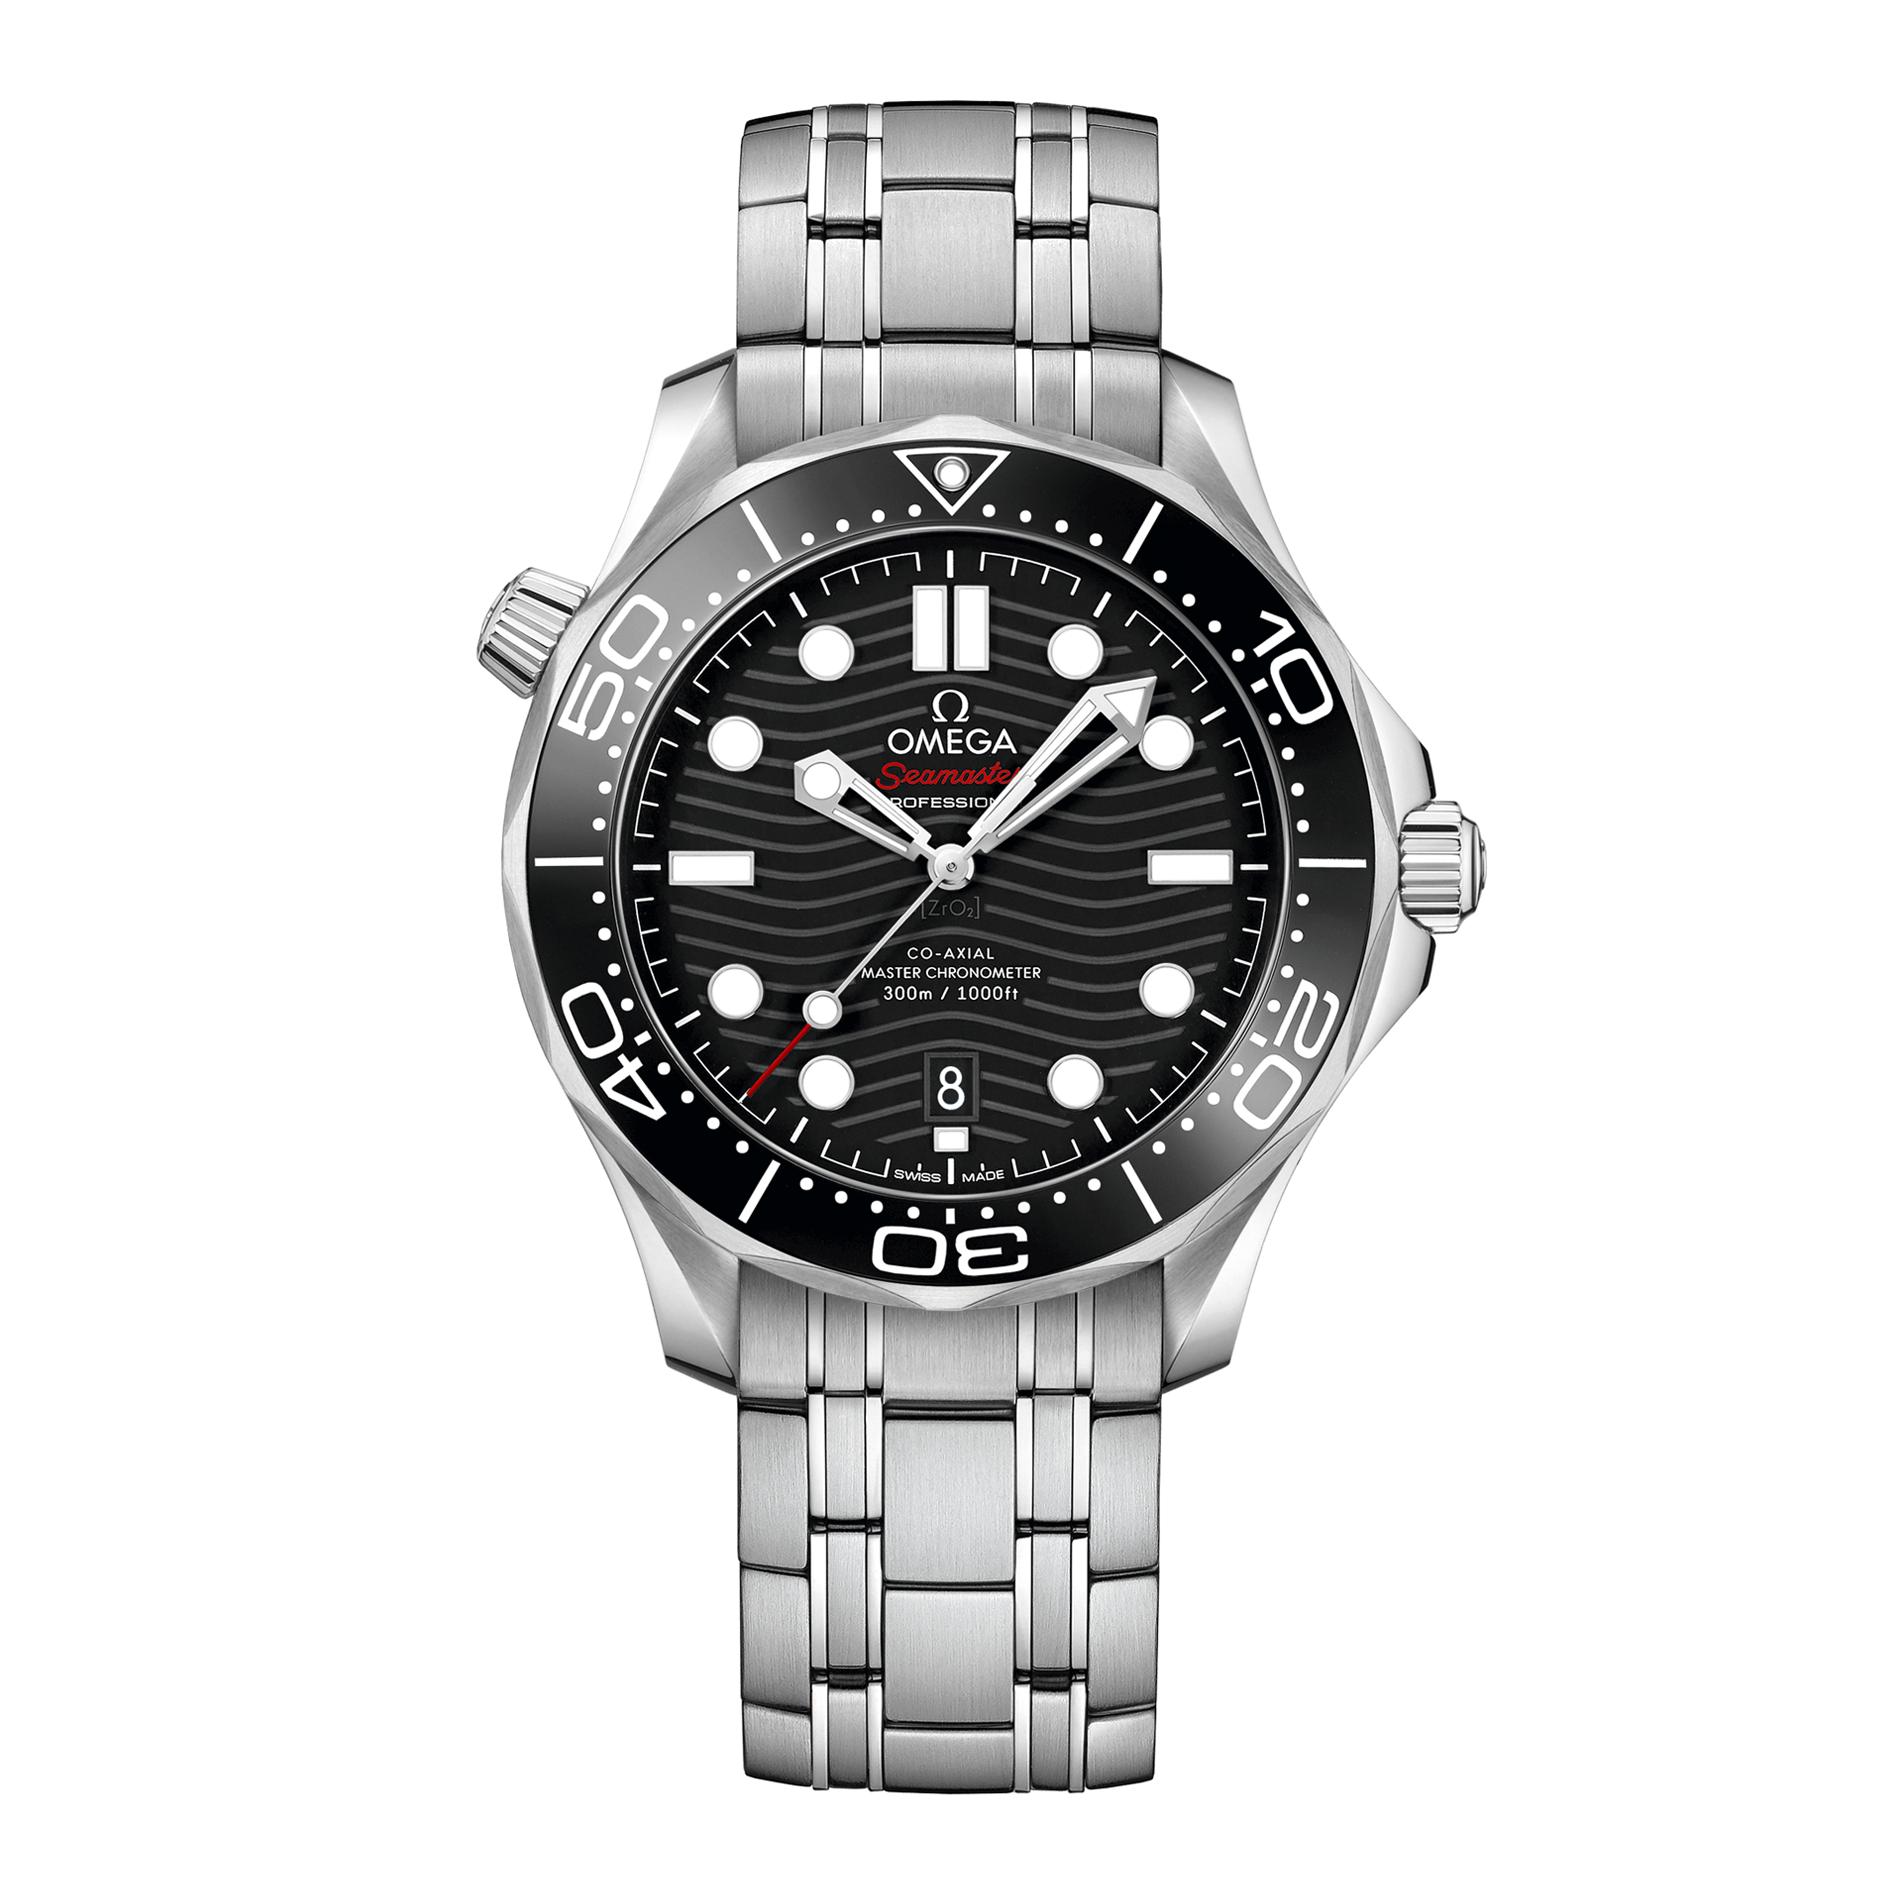 Reloj Omega – Diver 300M CoAxial Master Chronometer 42 - Amaya Joyeros